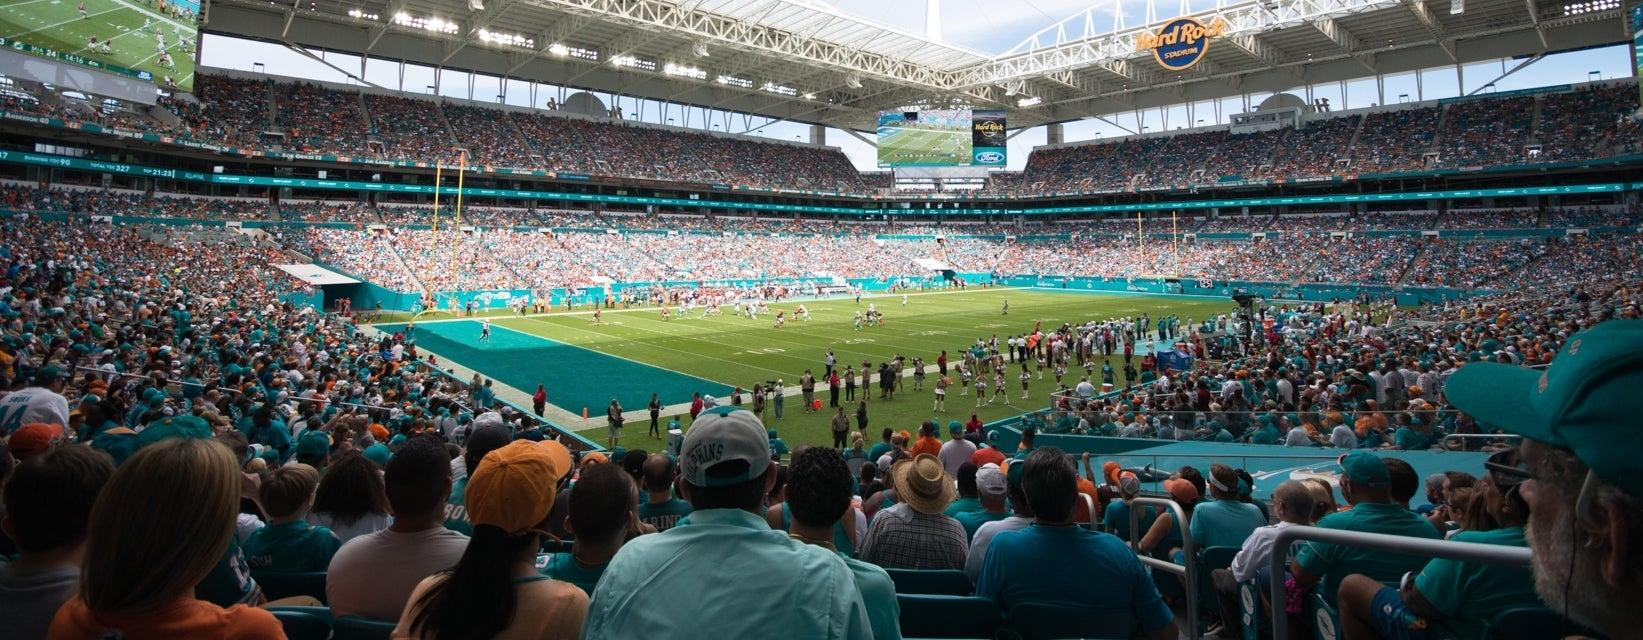 Super Bowl 2020 At Hard Rock Stadium In Miami   Gametime in Super Bowl 2020 Tickets